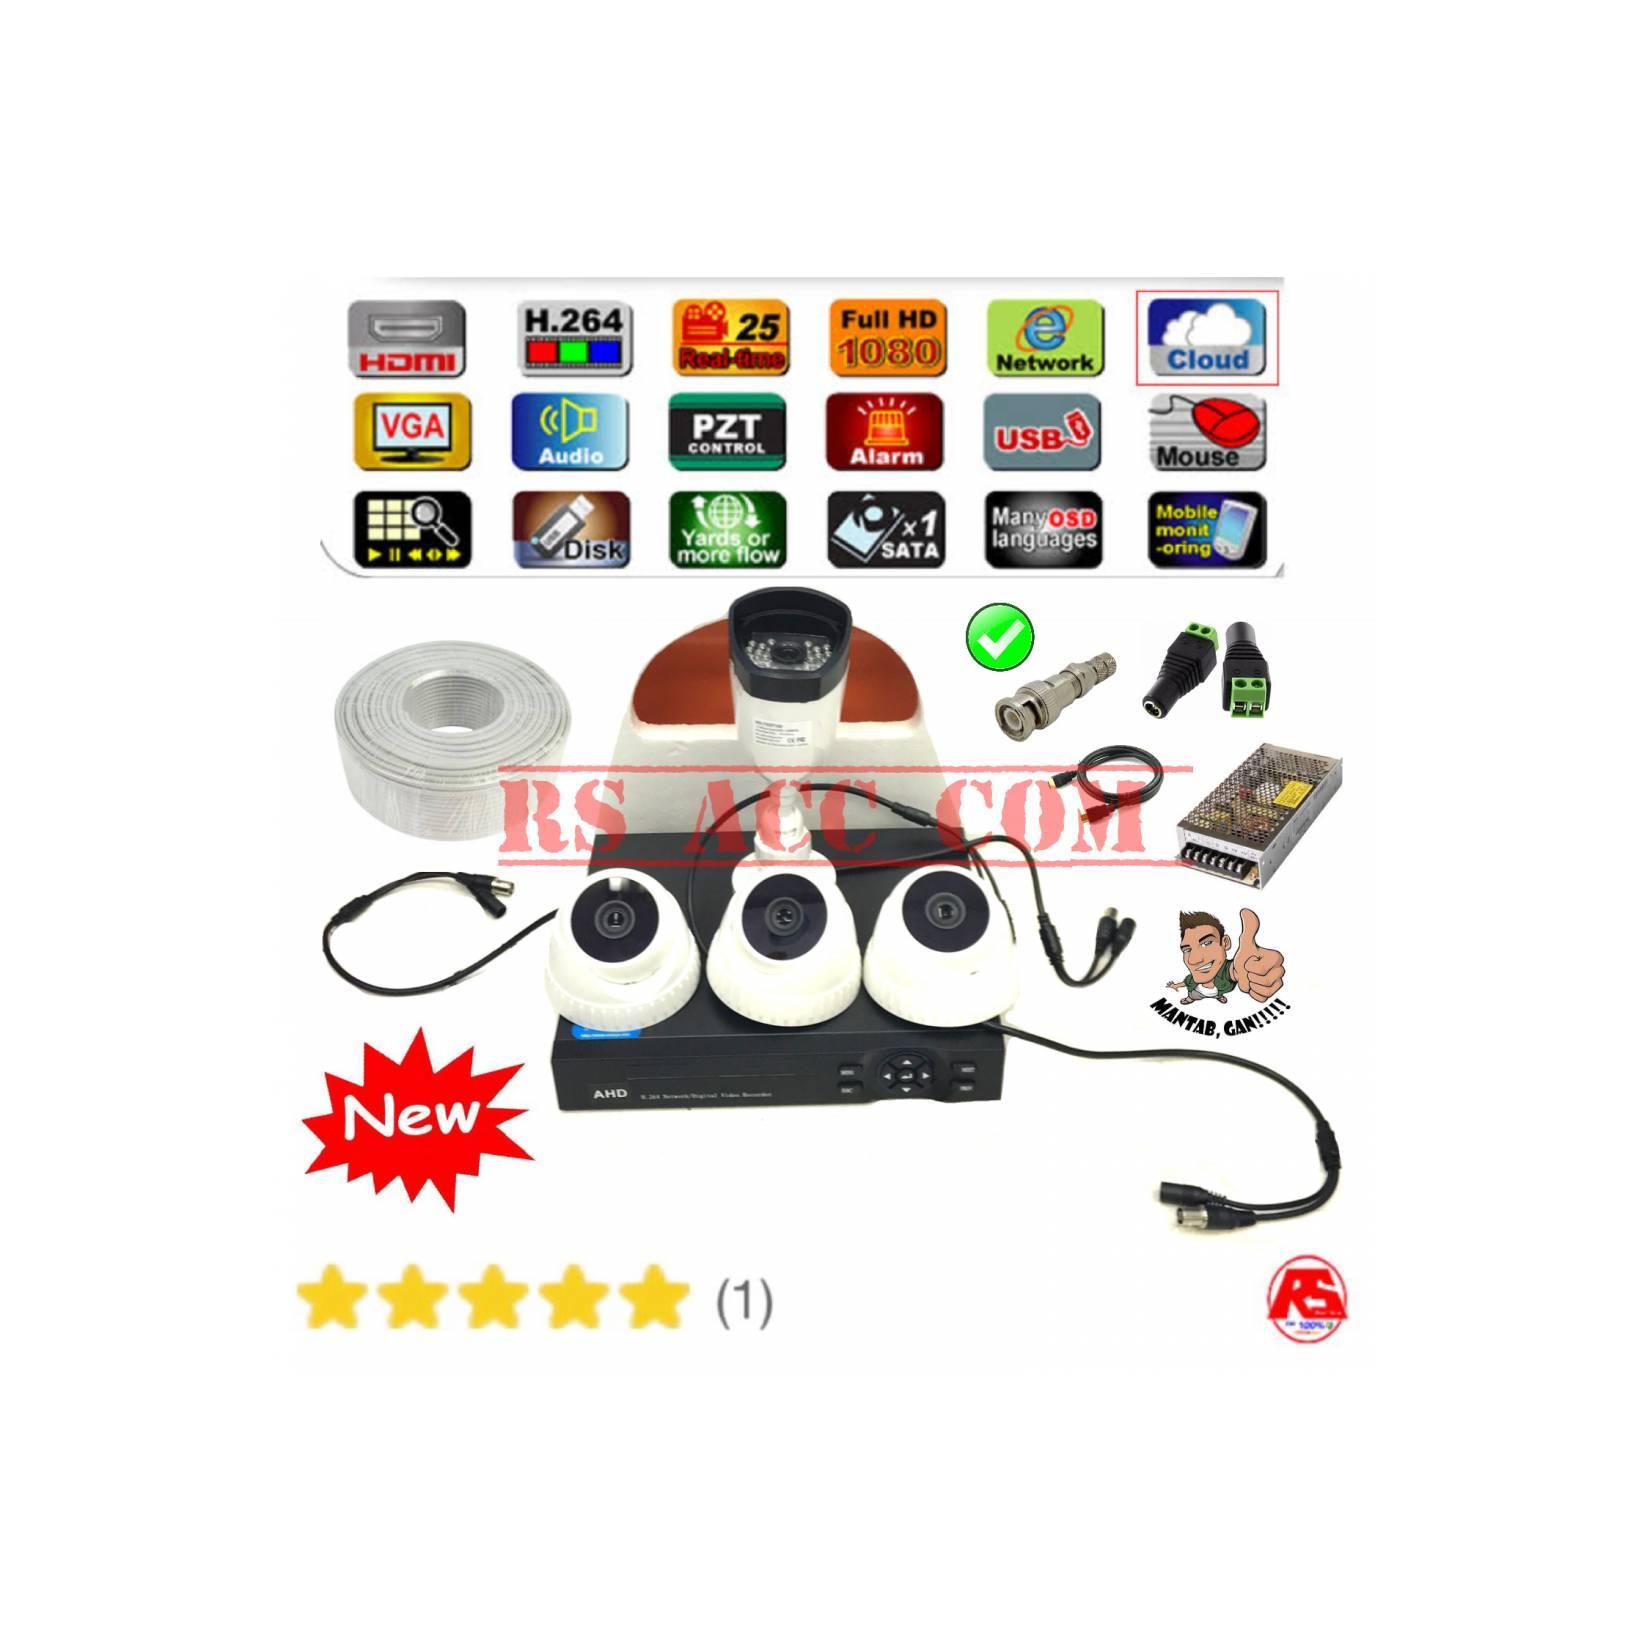 Murah Promo Paket 4 Camera Cctv 3MP Hardisk 1TB Komplit